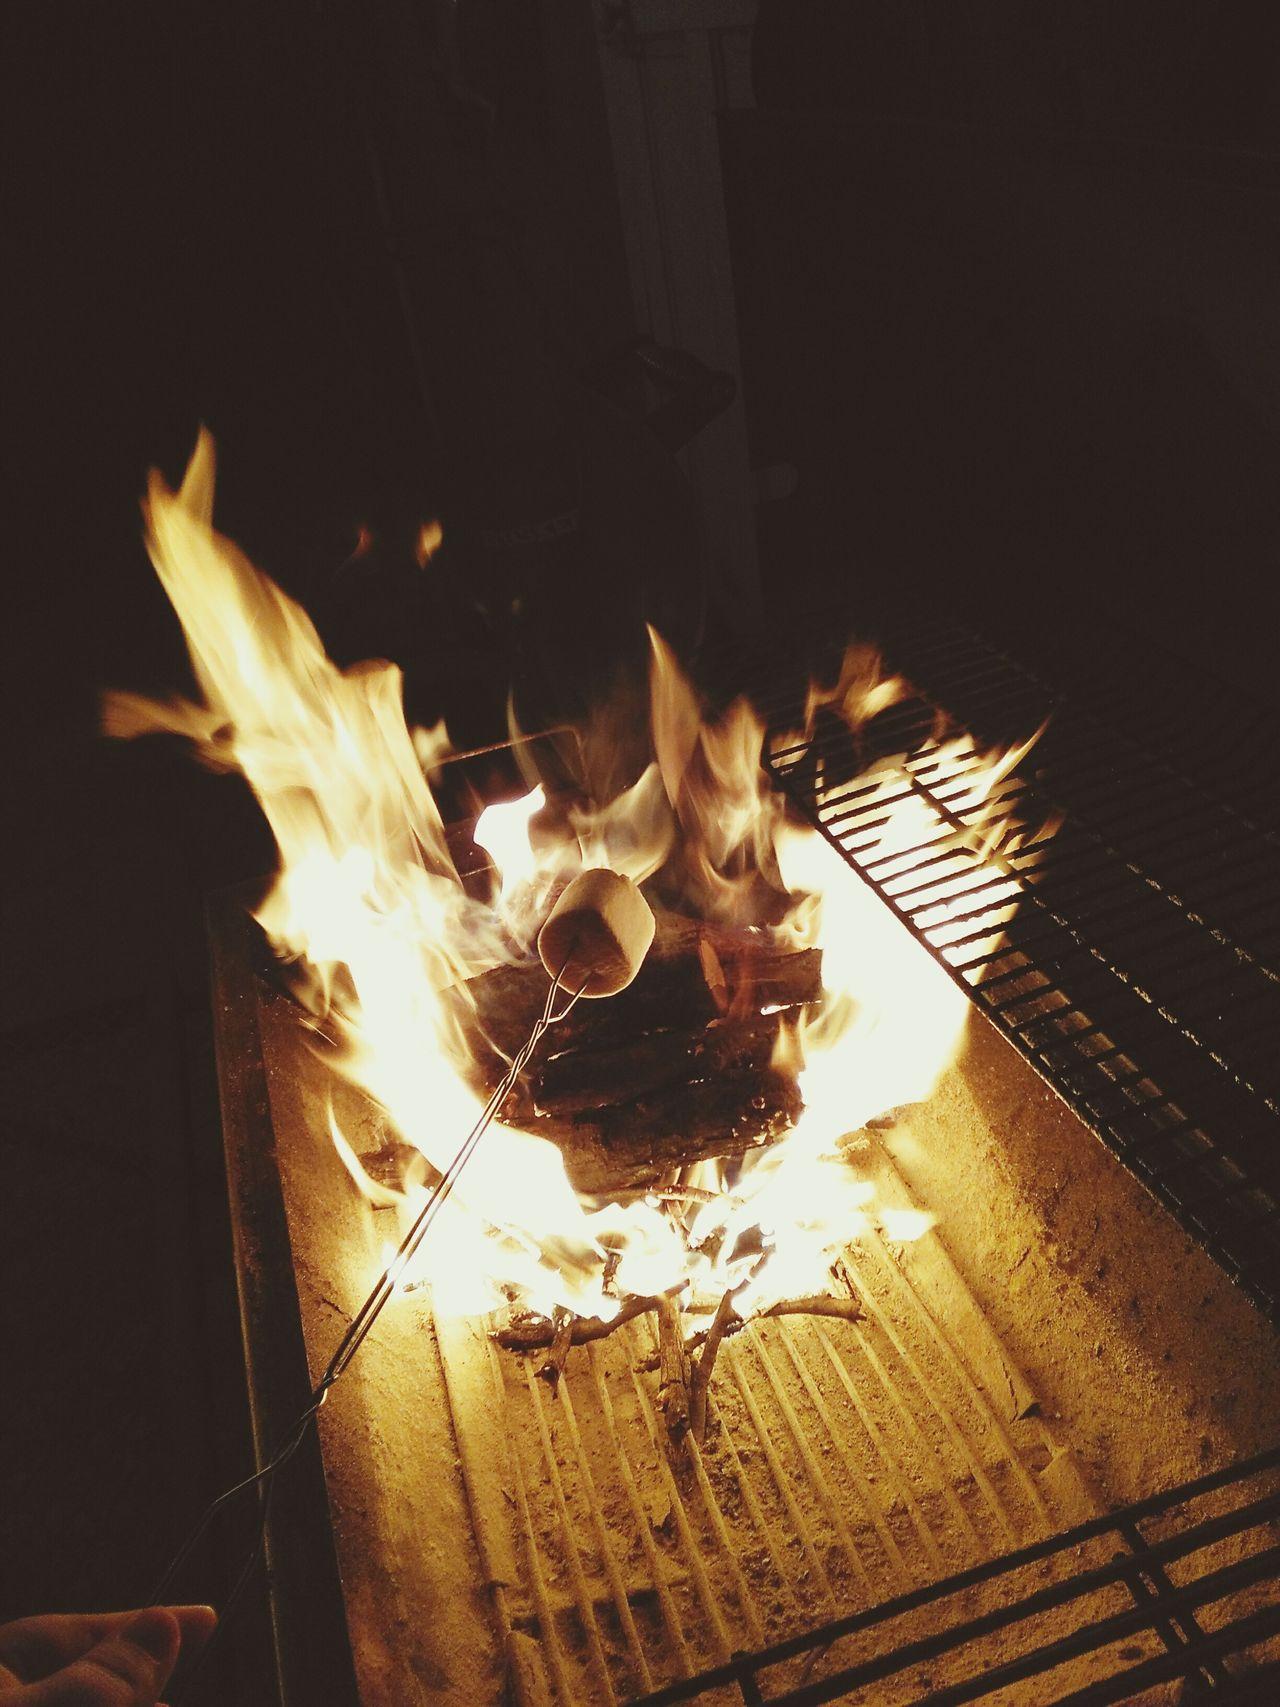 Flame Burning Roasting Marshmallows Fire